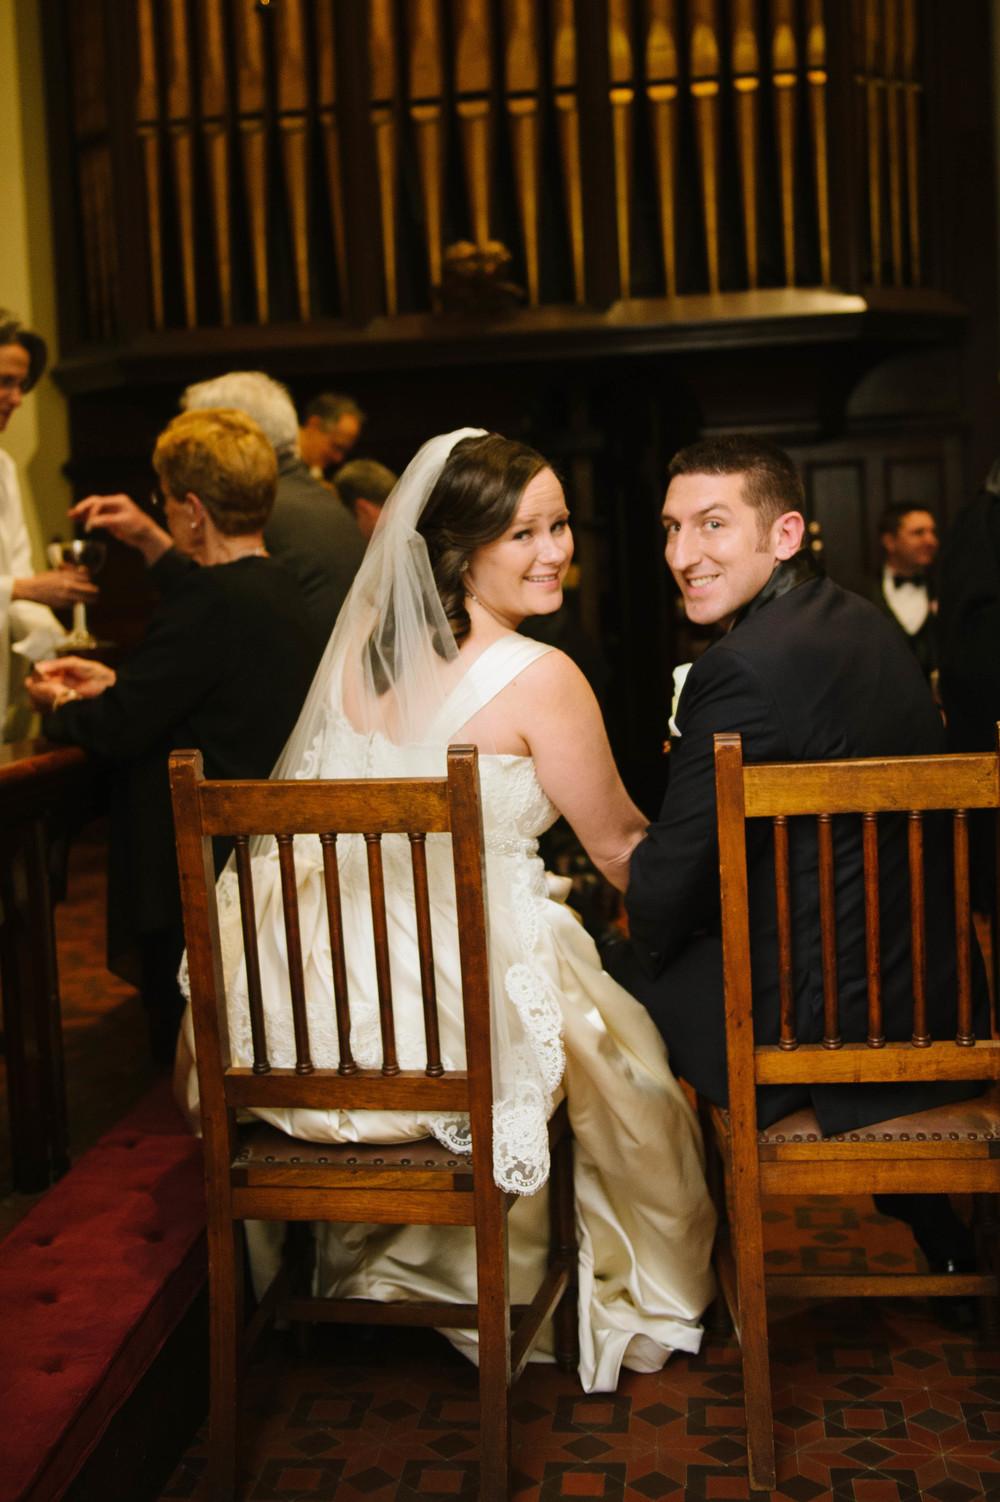 Alden_Castle_Wedding-37.jpg